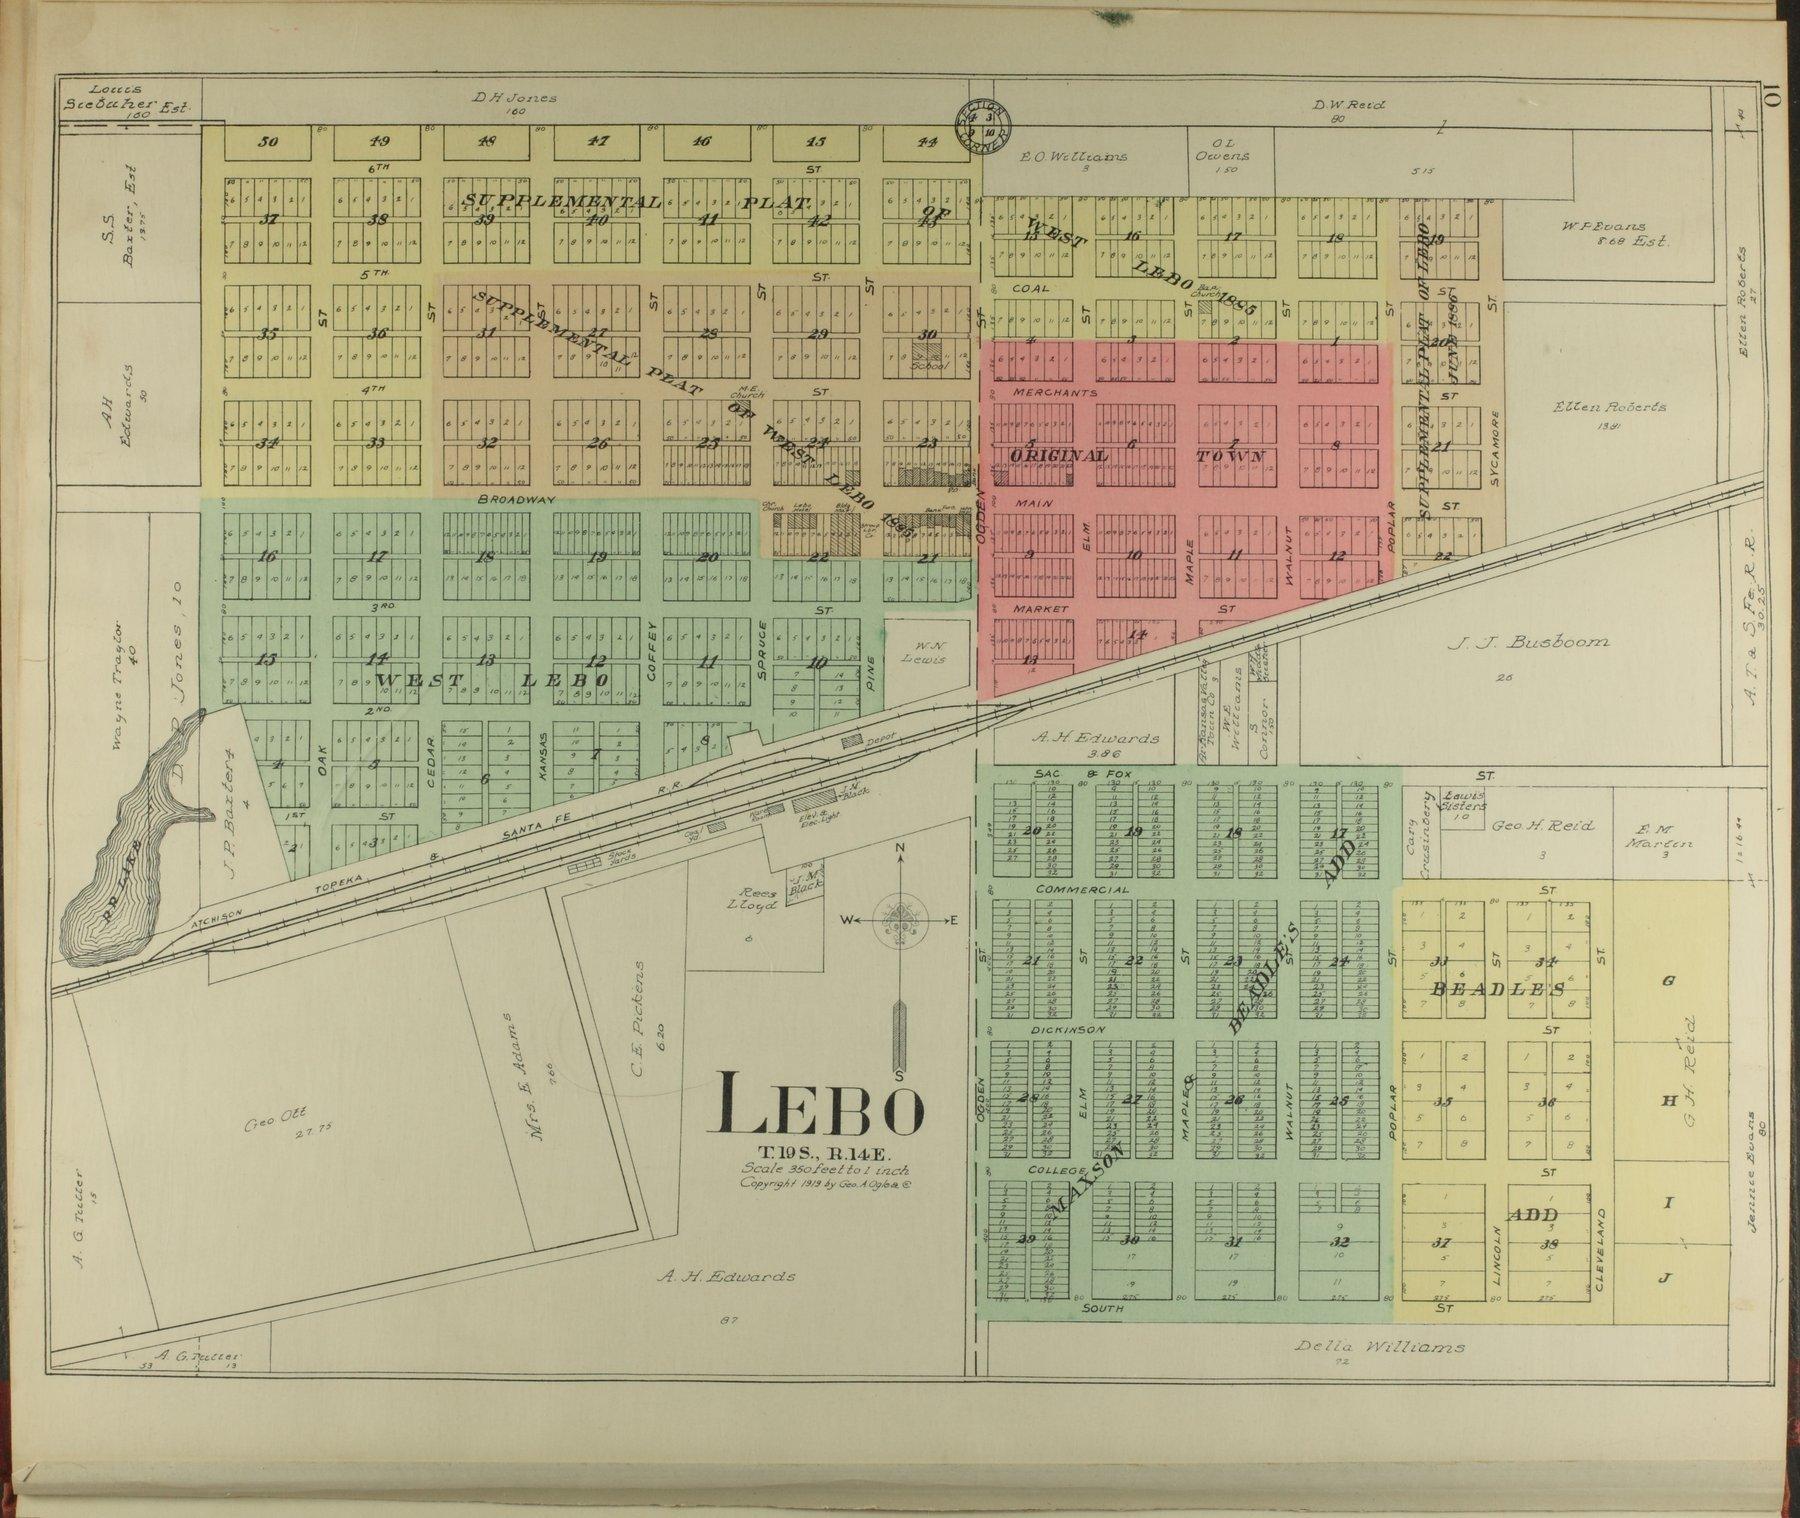 Standard atlas of Coffey County, Kansas - 10